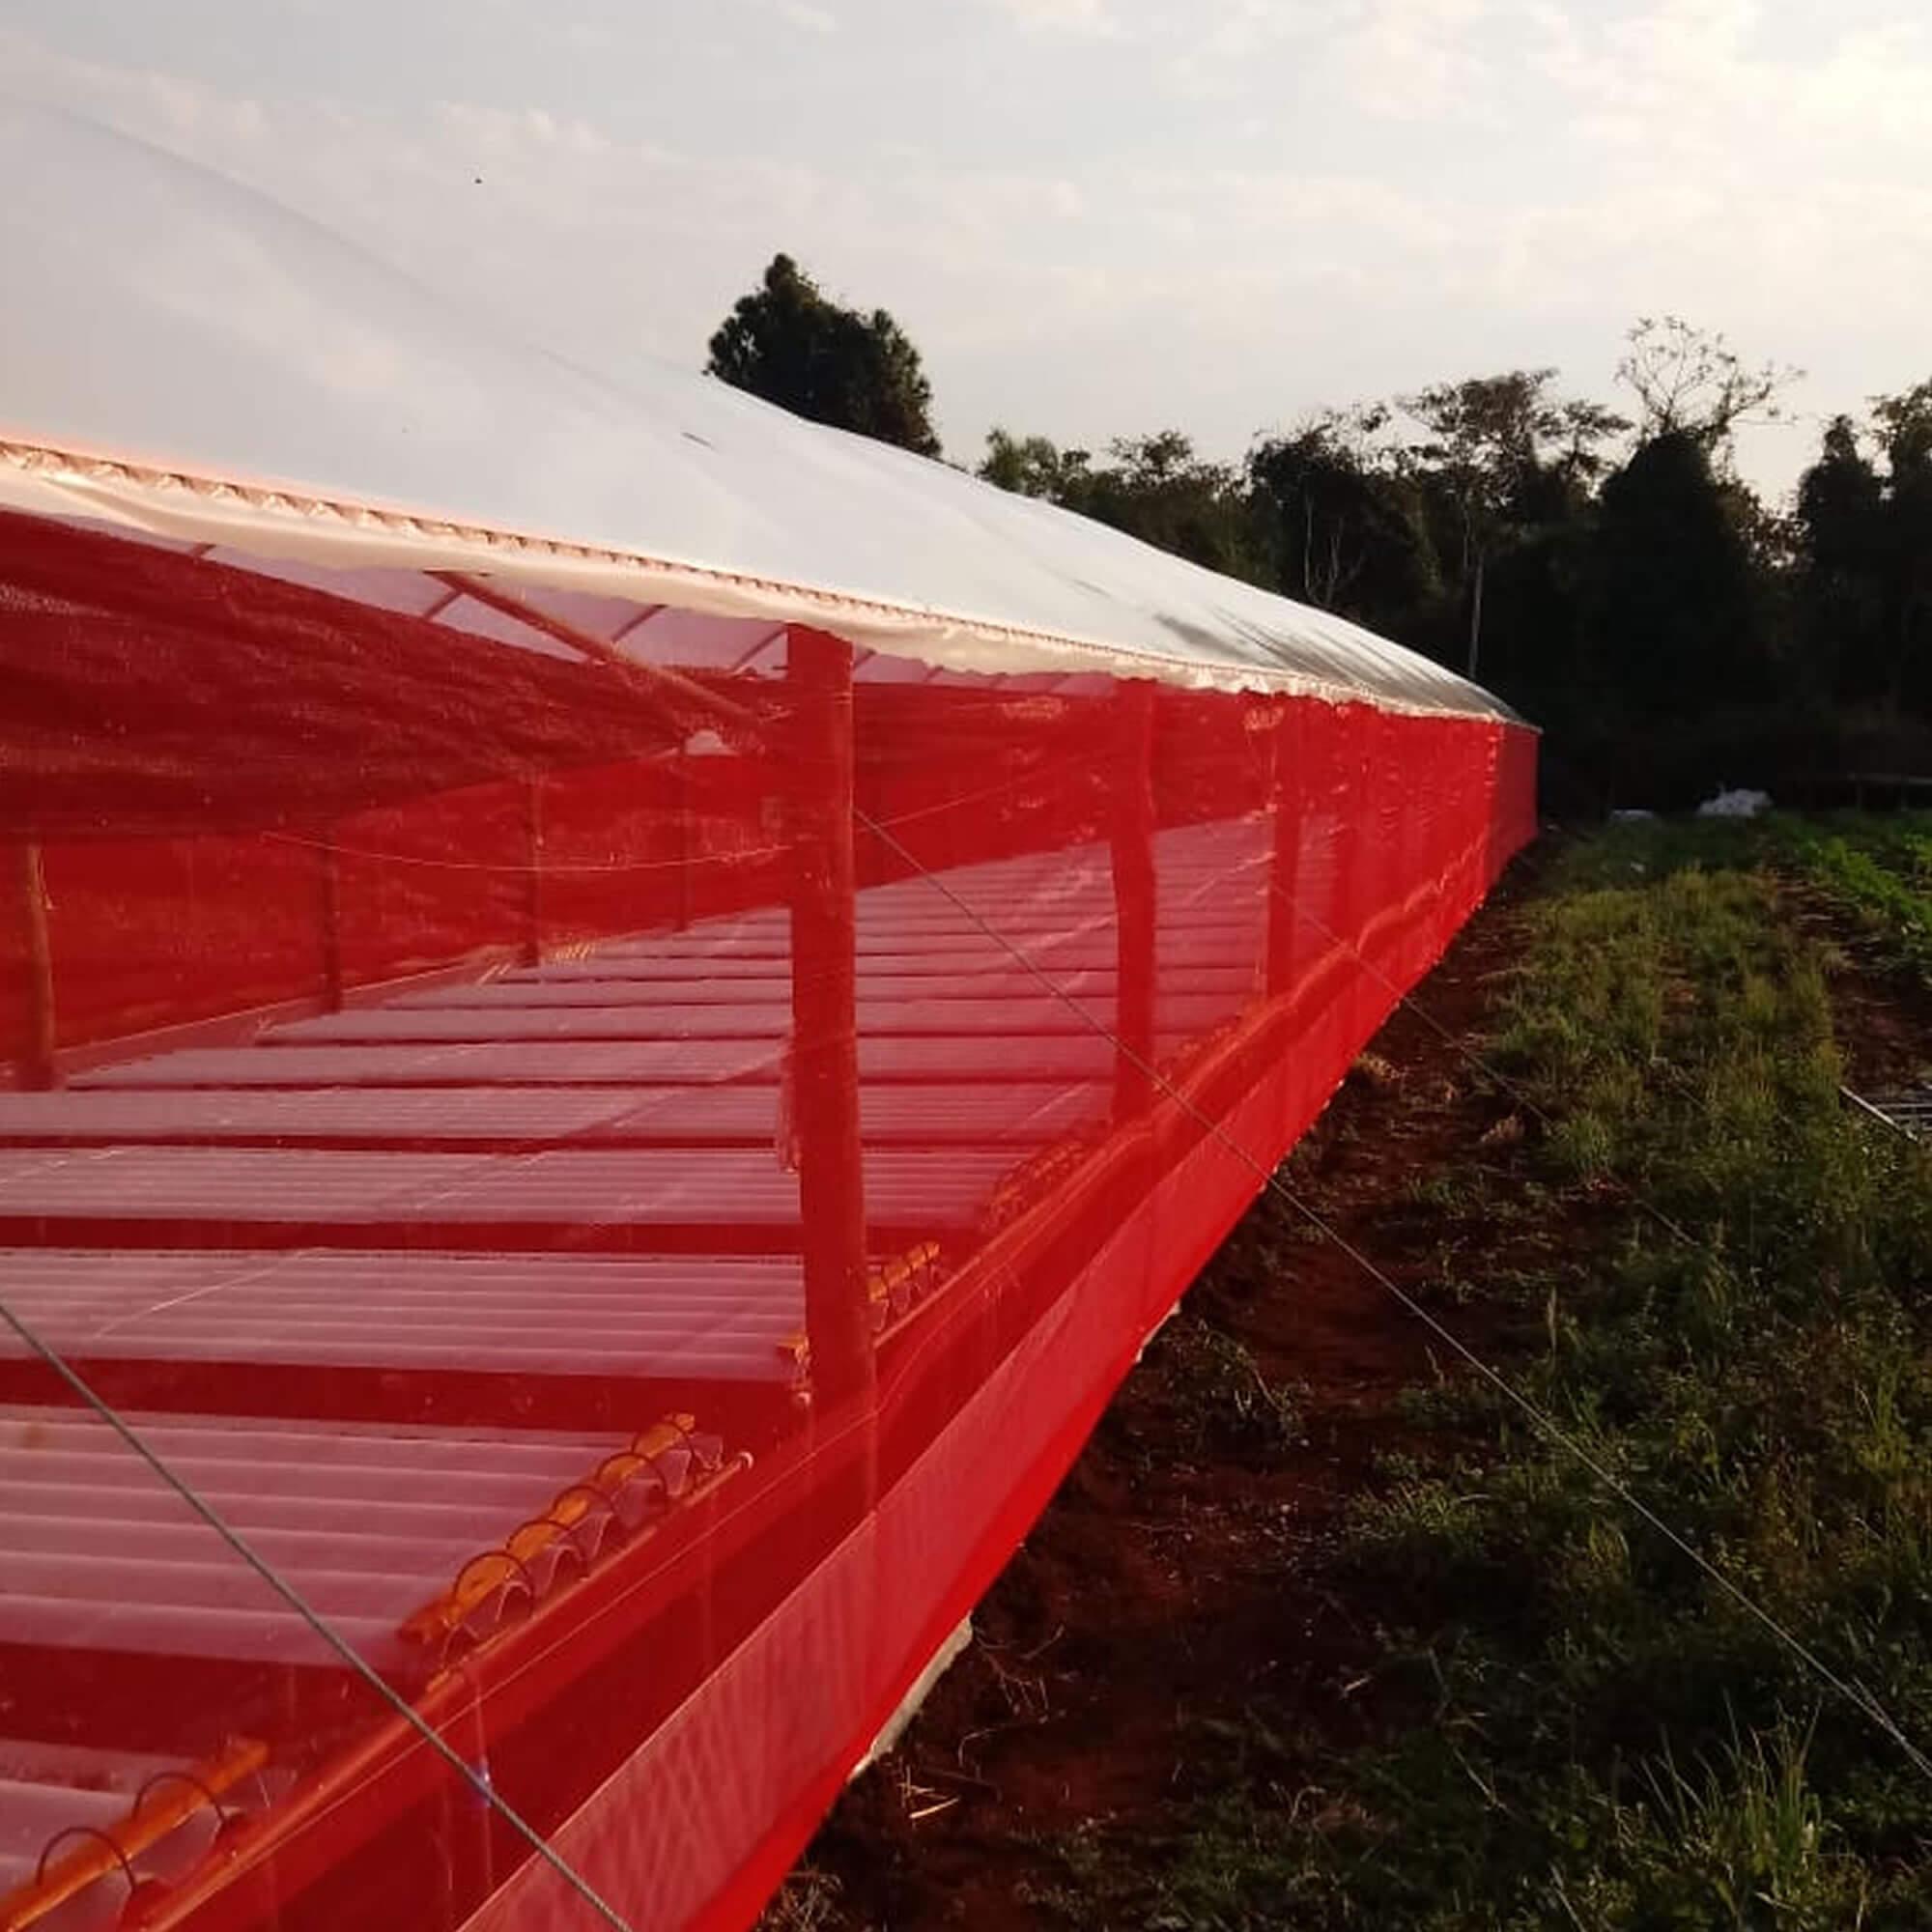 Tela de Sombreamento Vermelha 20% - 3 x 50 metros